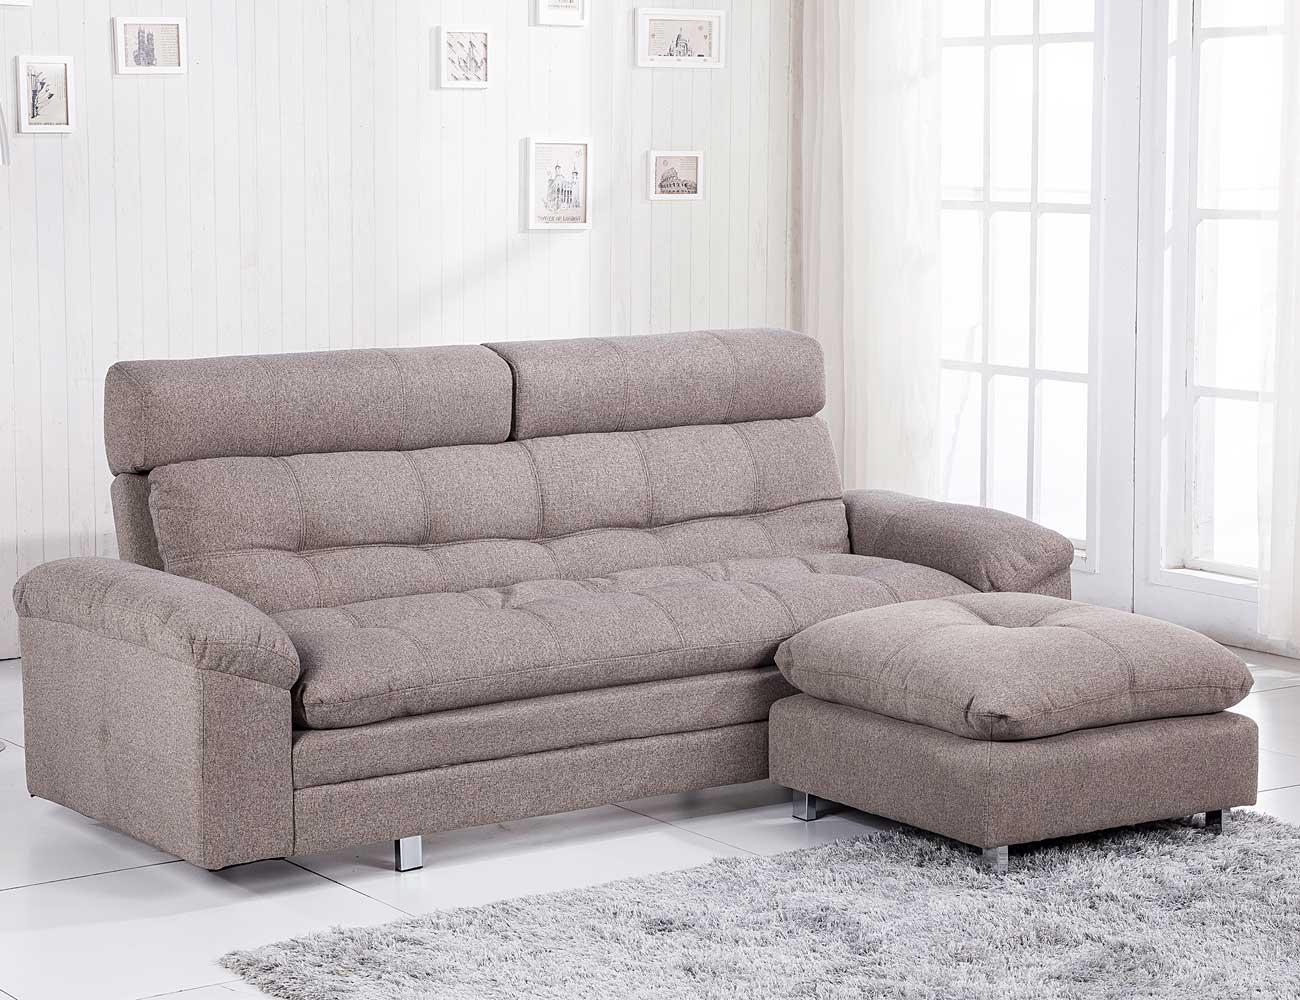 Sofa cama chaiselongue elegance moka 1